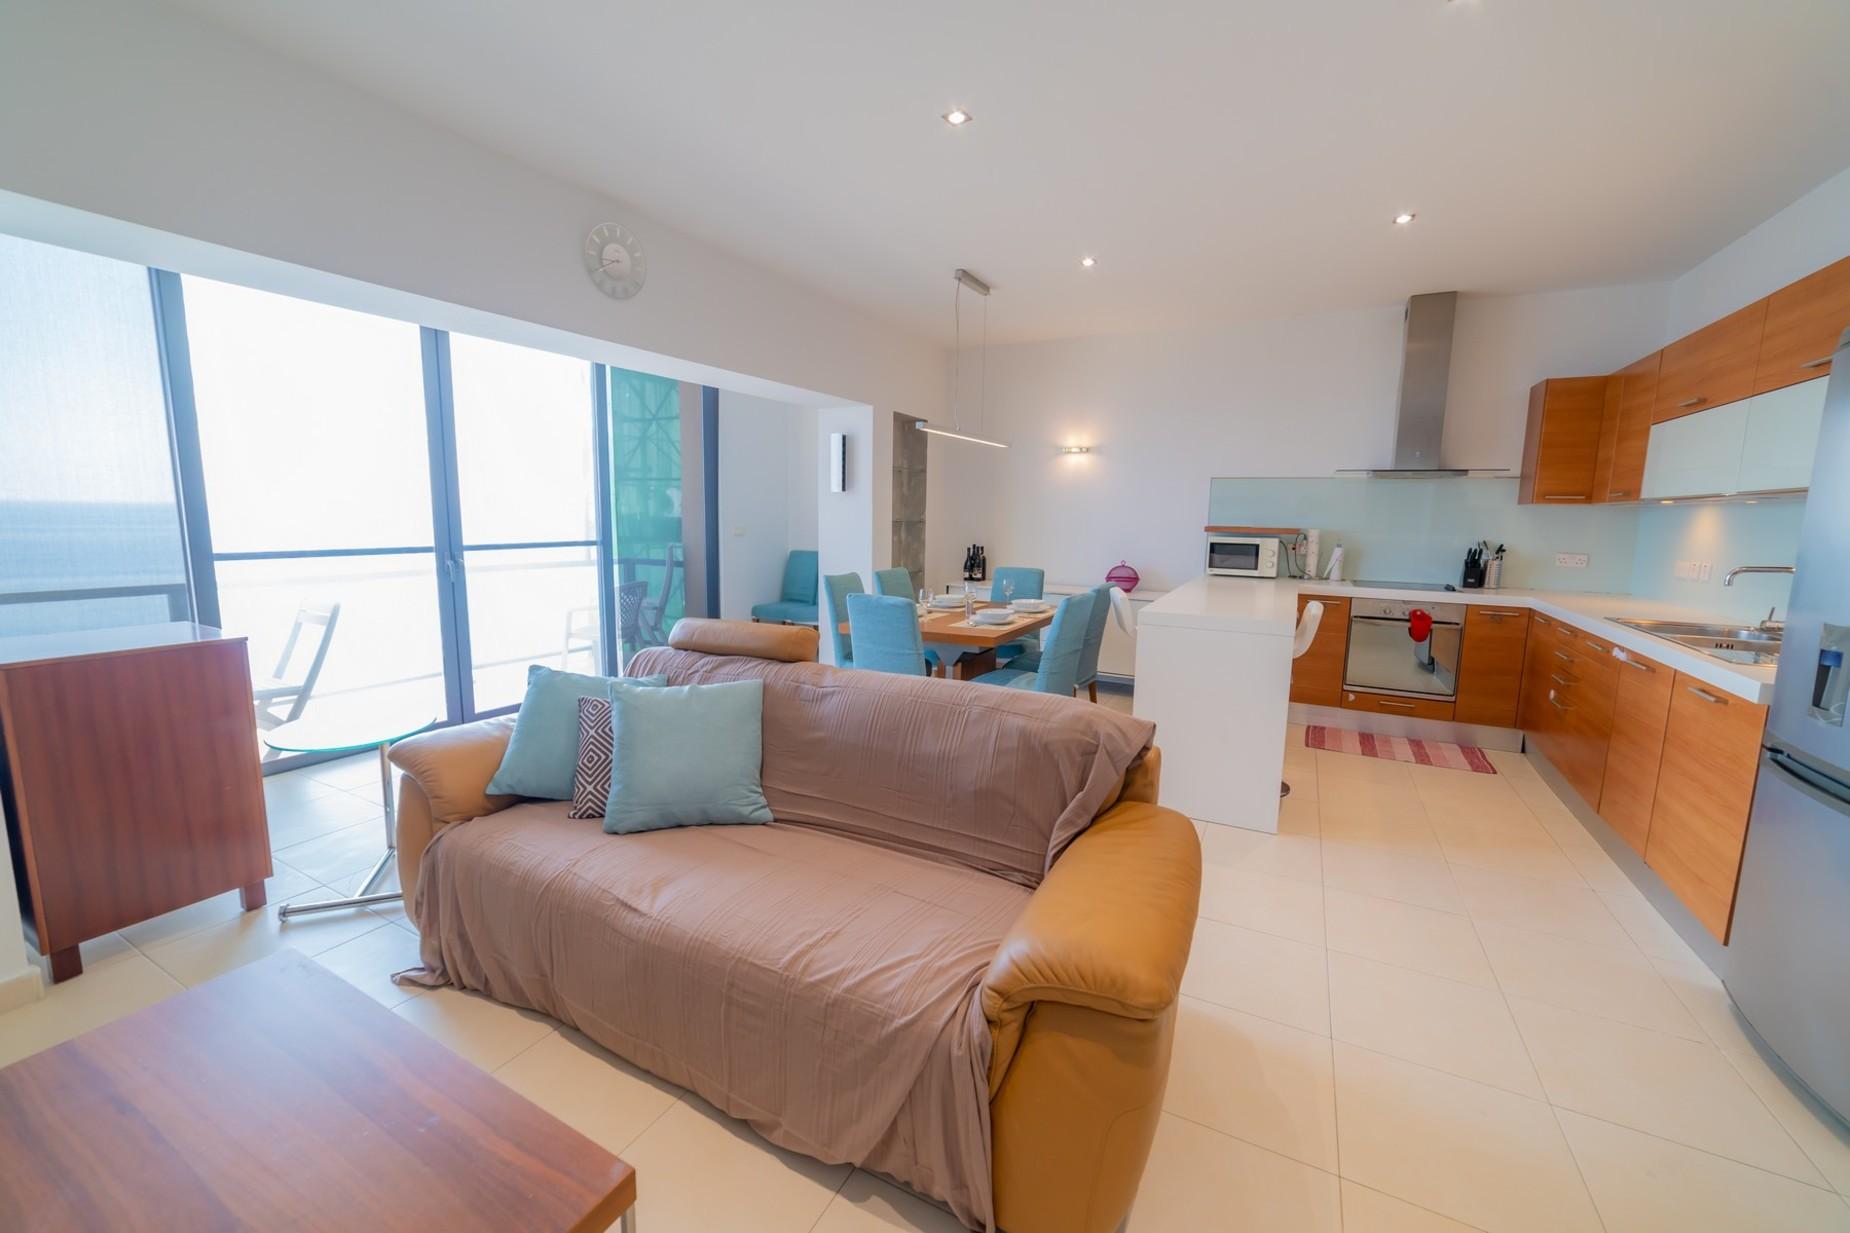 3 bed Apartment For Rent in Sliema, Sliema - thumb 3